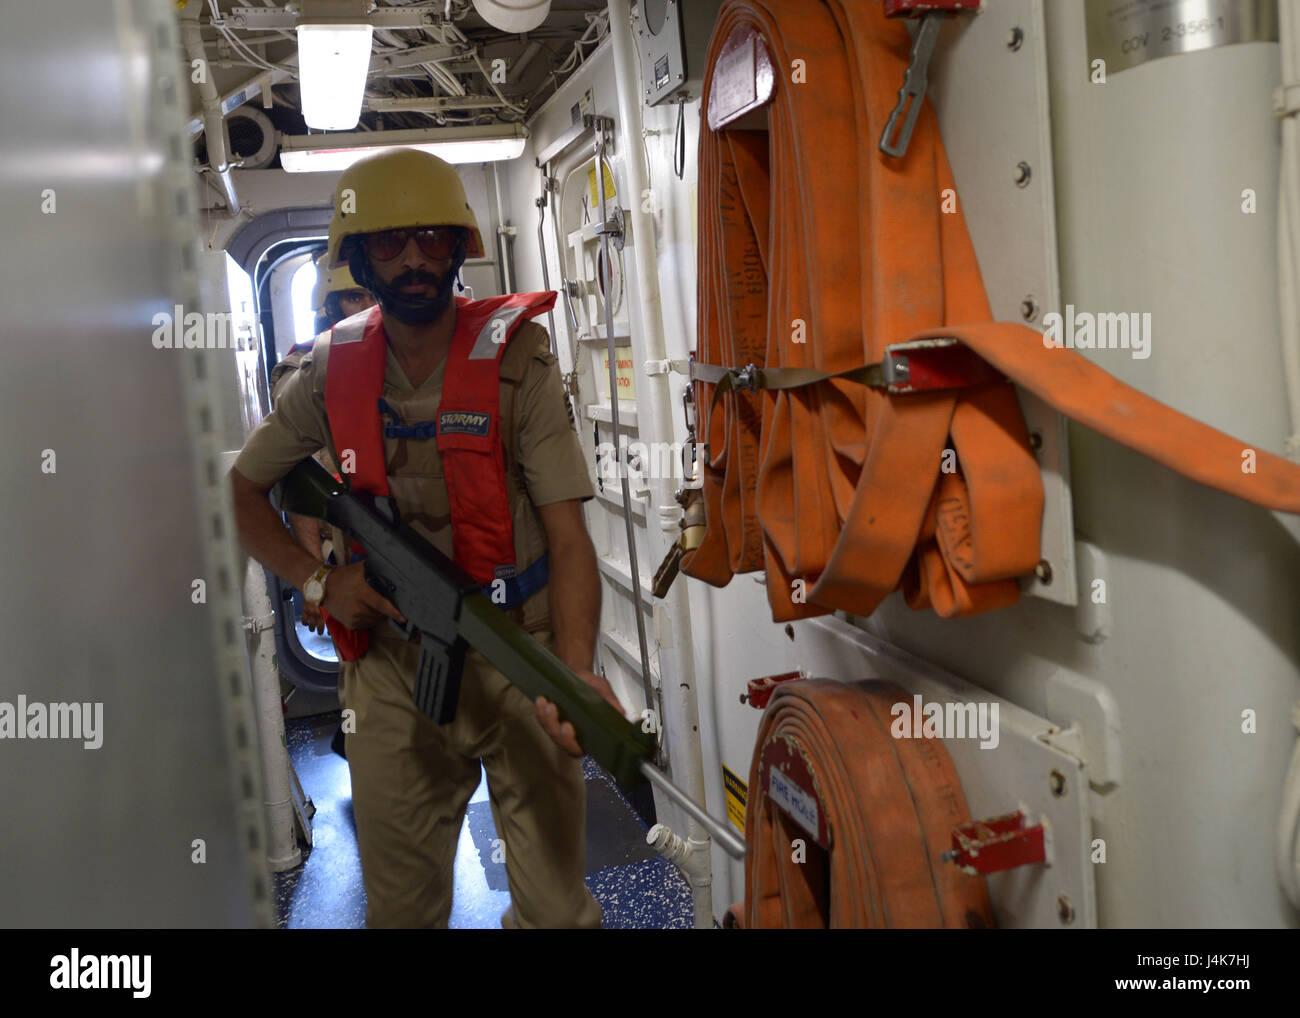 {170503-N-VC432-0045} ARABIAN SEA, Saudi Arabia (May 03, 2017) –A Royal Saudi Navy visit, board, search and seizure - Stock Image